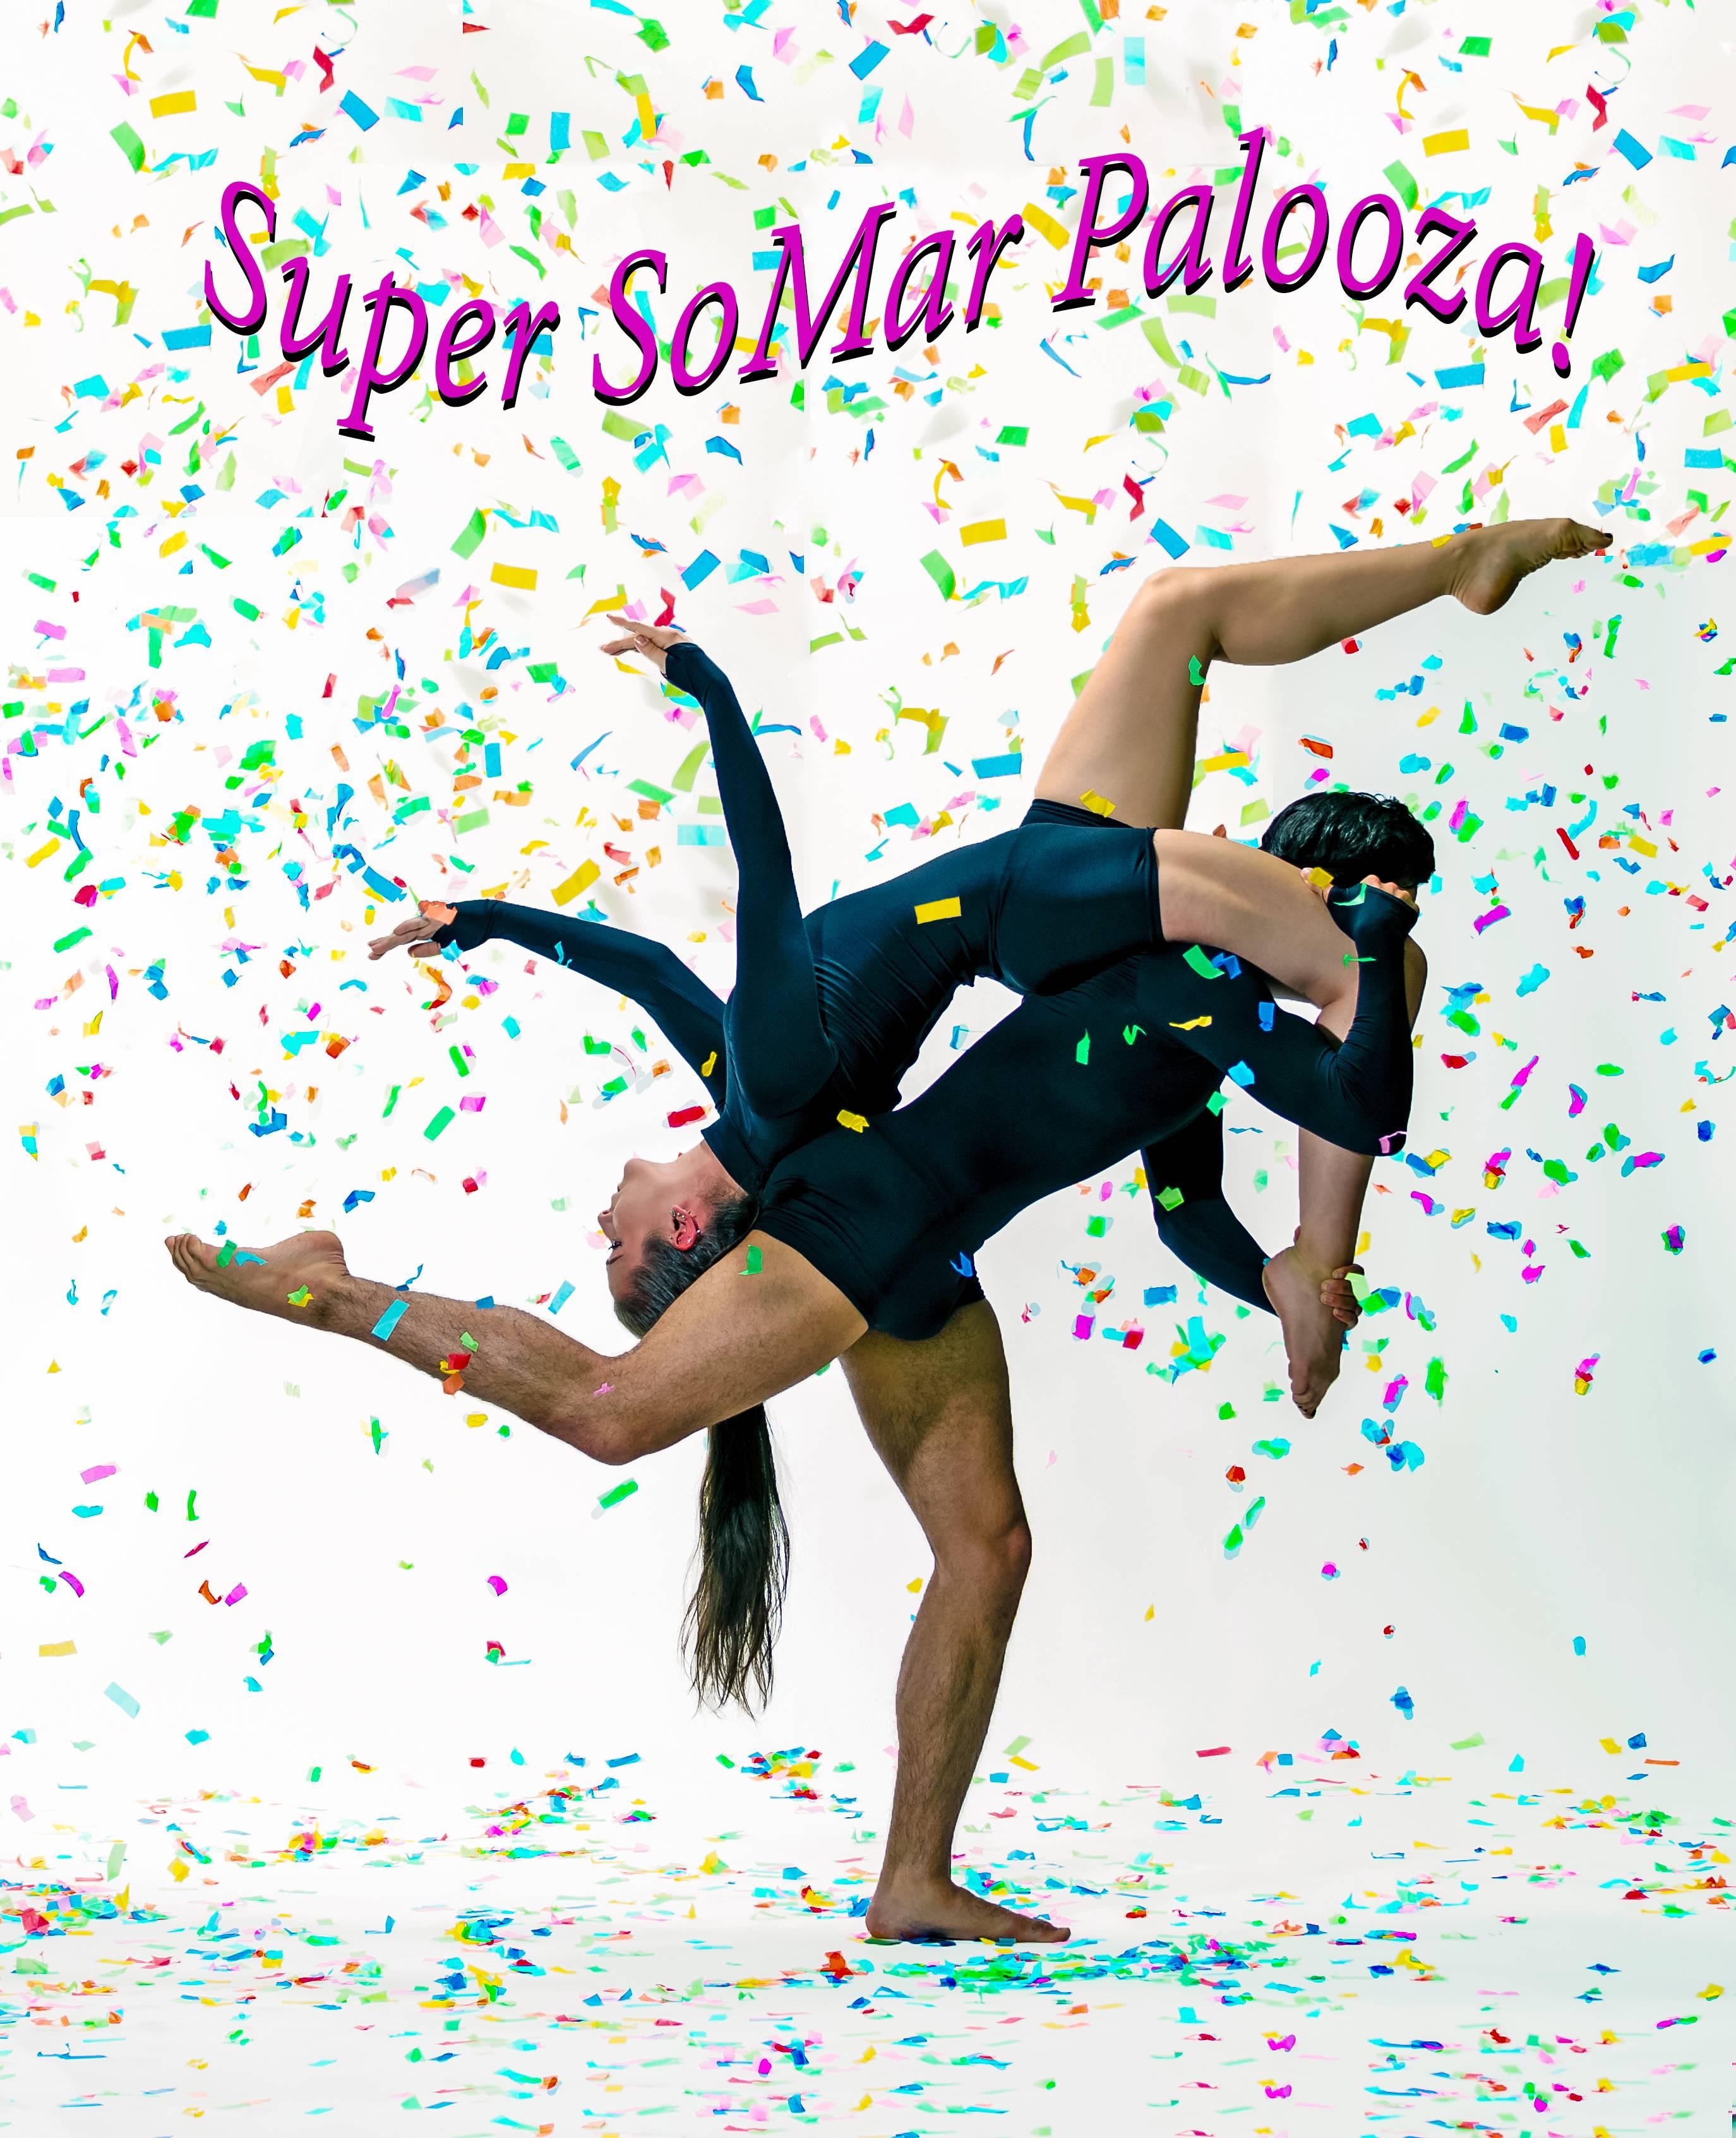 Super SoMar Palooza!